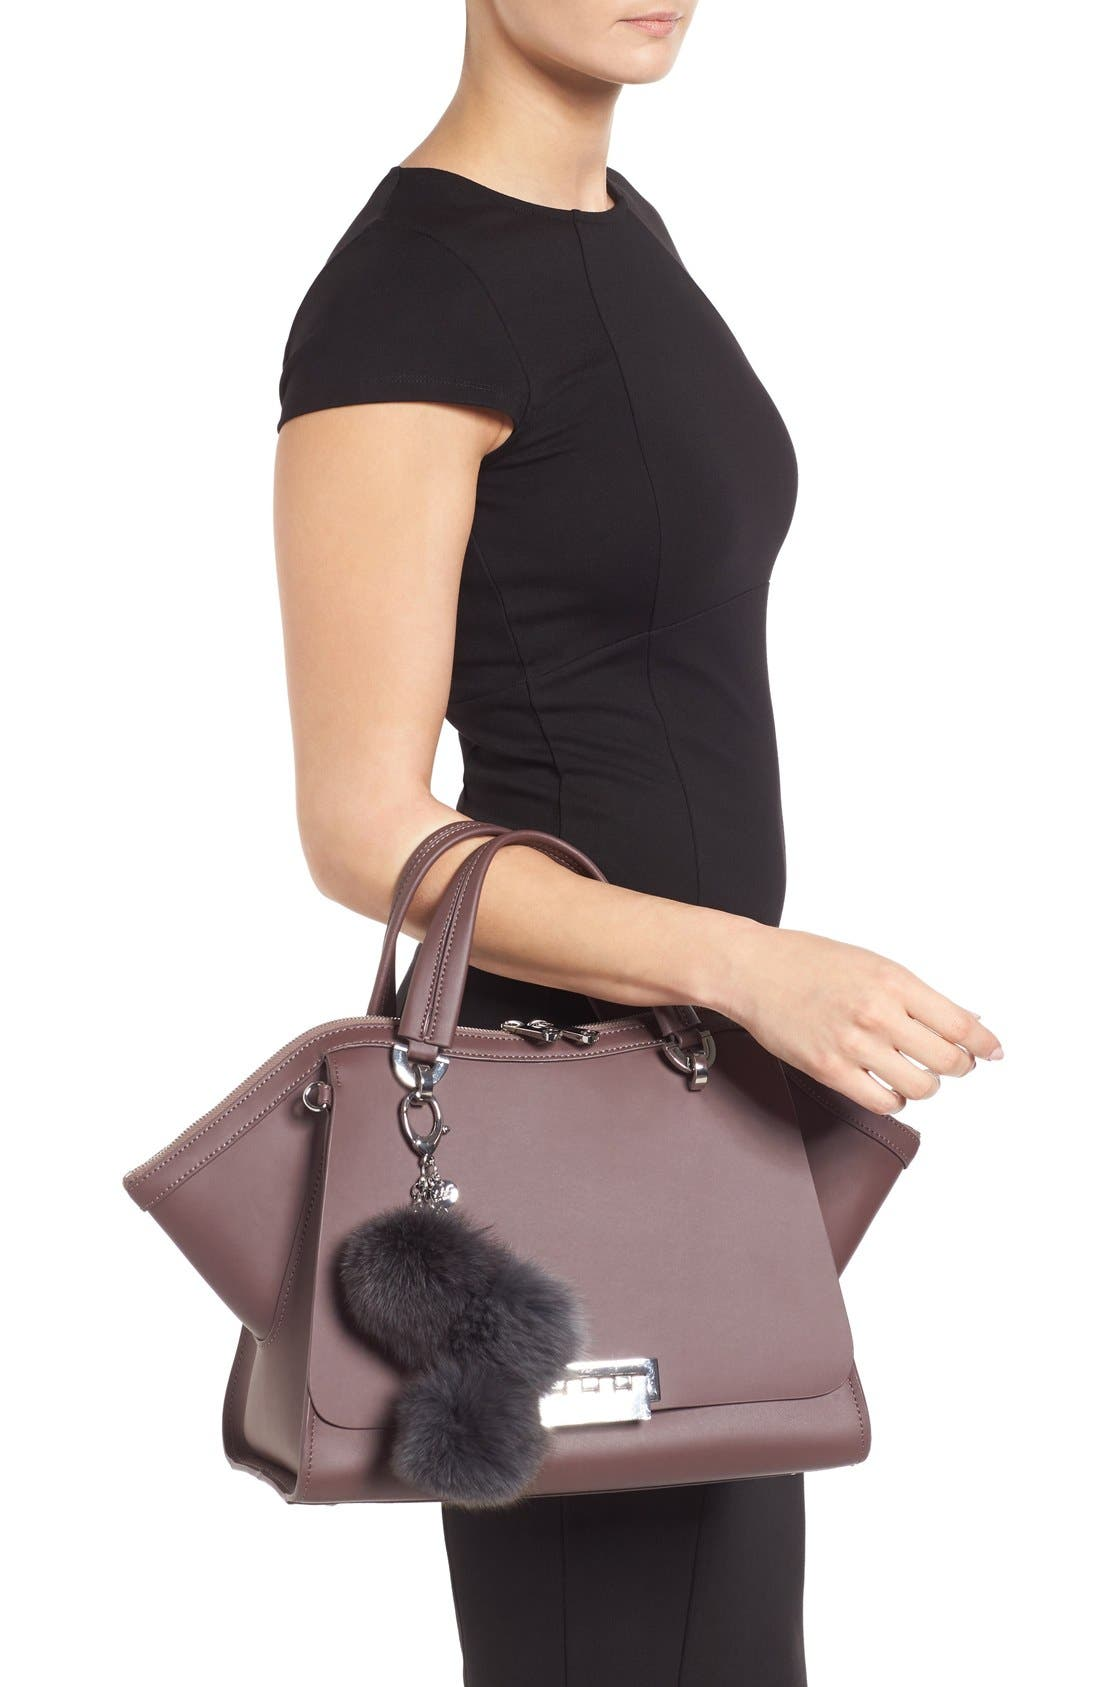 Alternate Image 2  - ZAC Zac Posen Jumbo Eartha Iconic Leather Satchel with Genuine Fox Fur Bag Charm